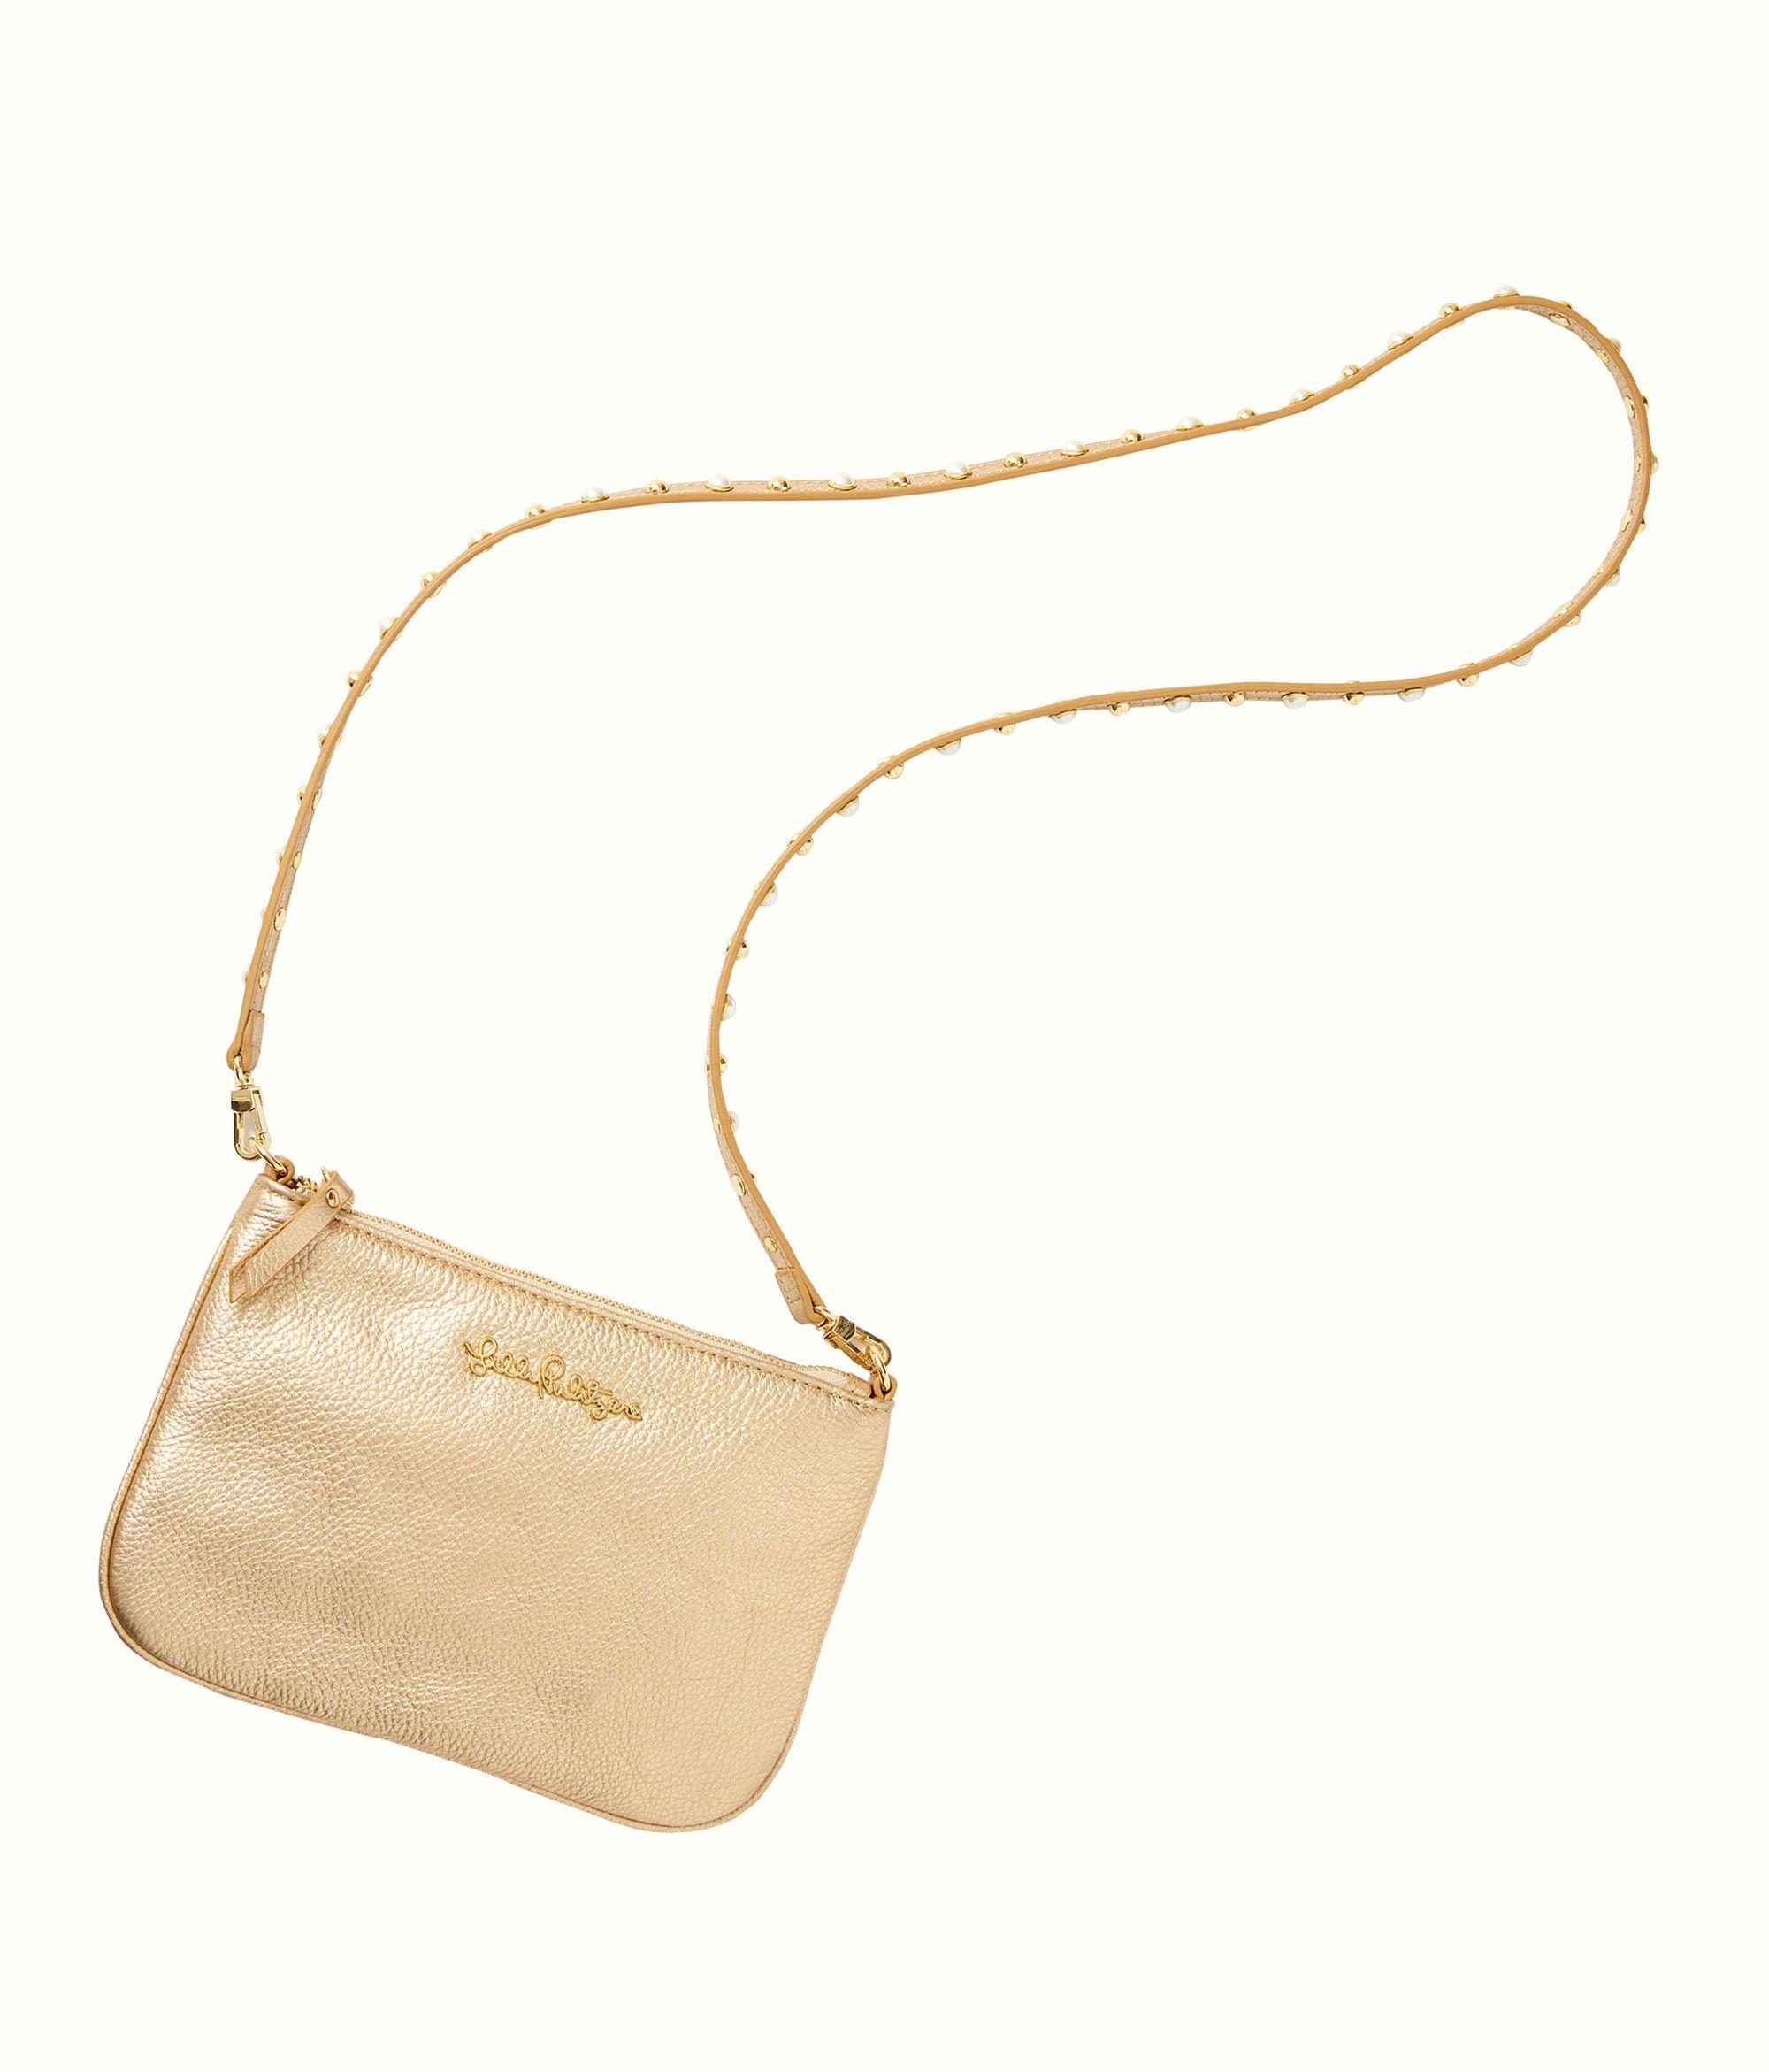 Lyst - Lilly Pulitzer Studded Leather Cruisin Crossbody Bag b1c76e86e6072